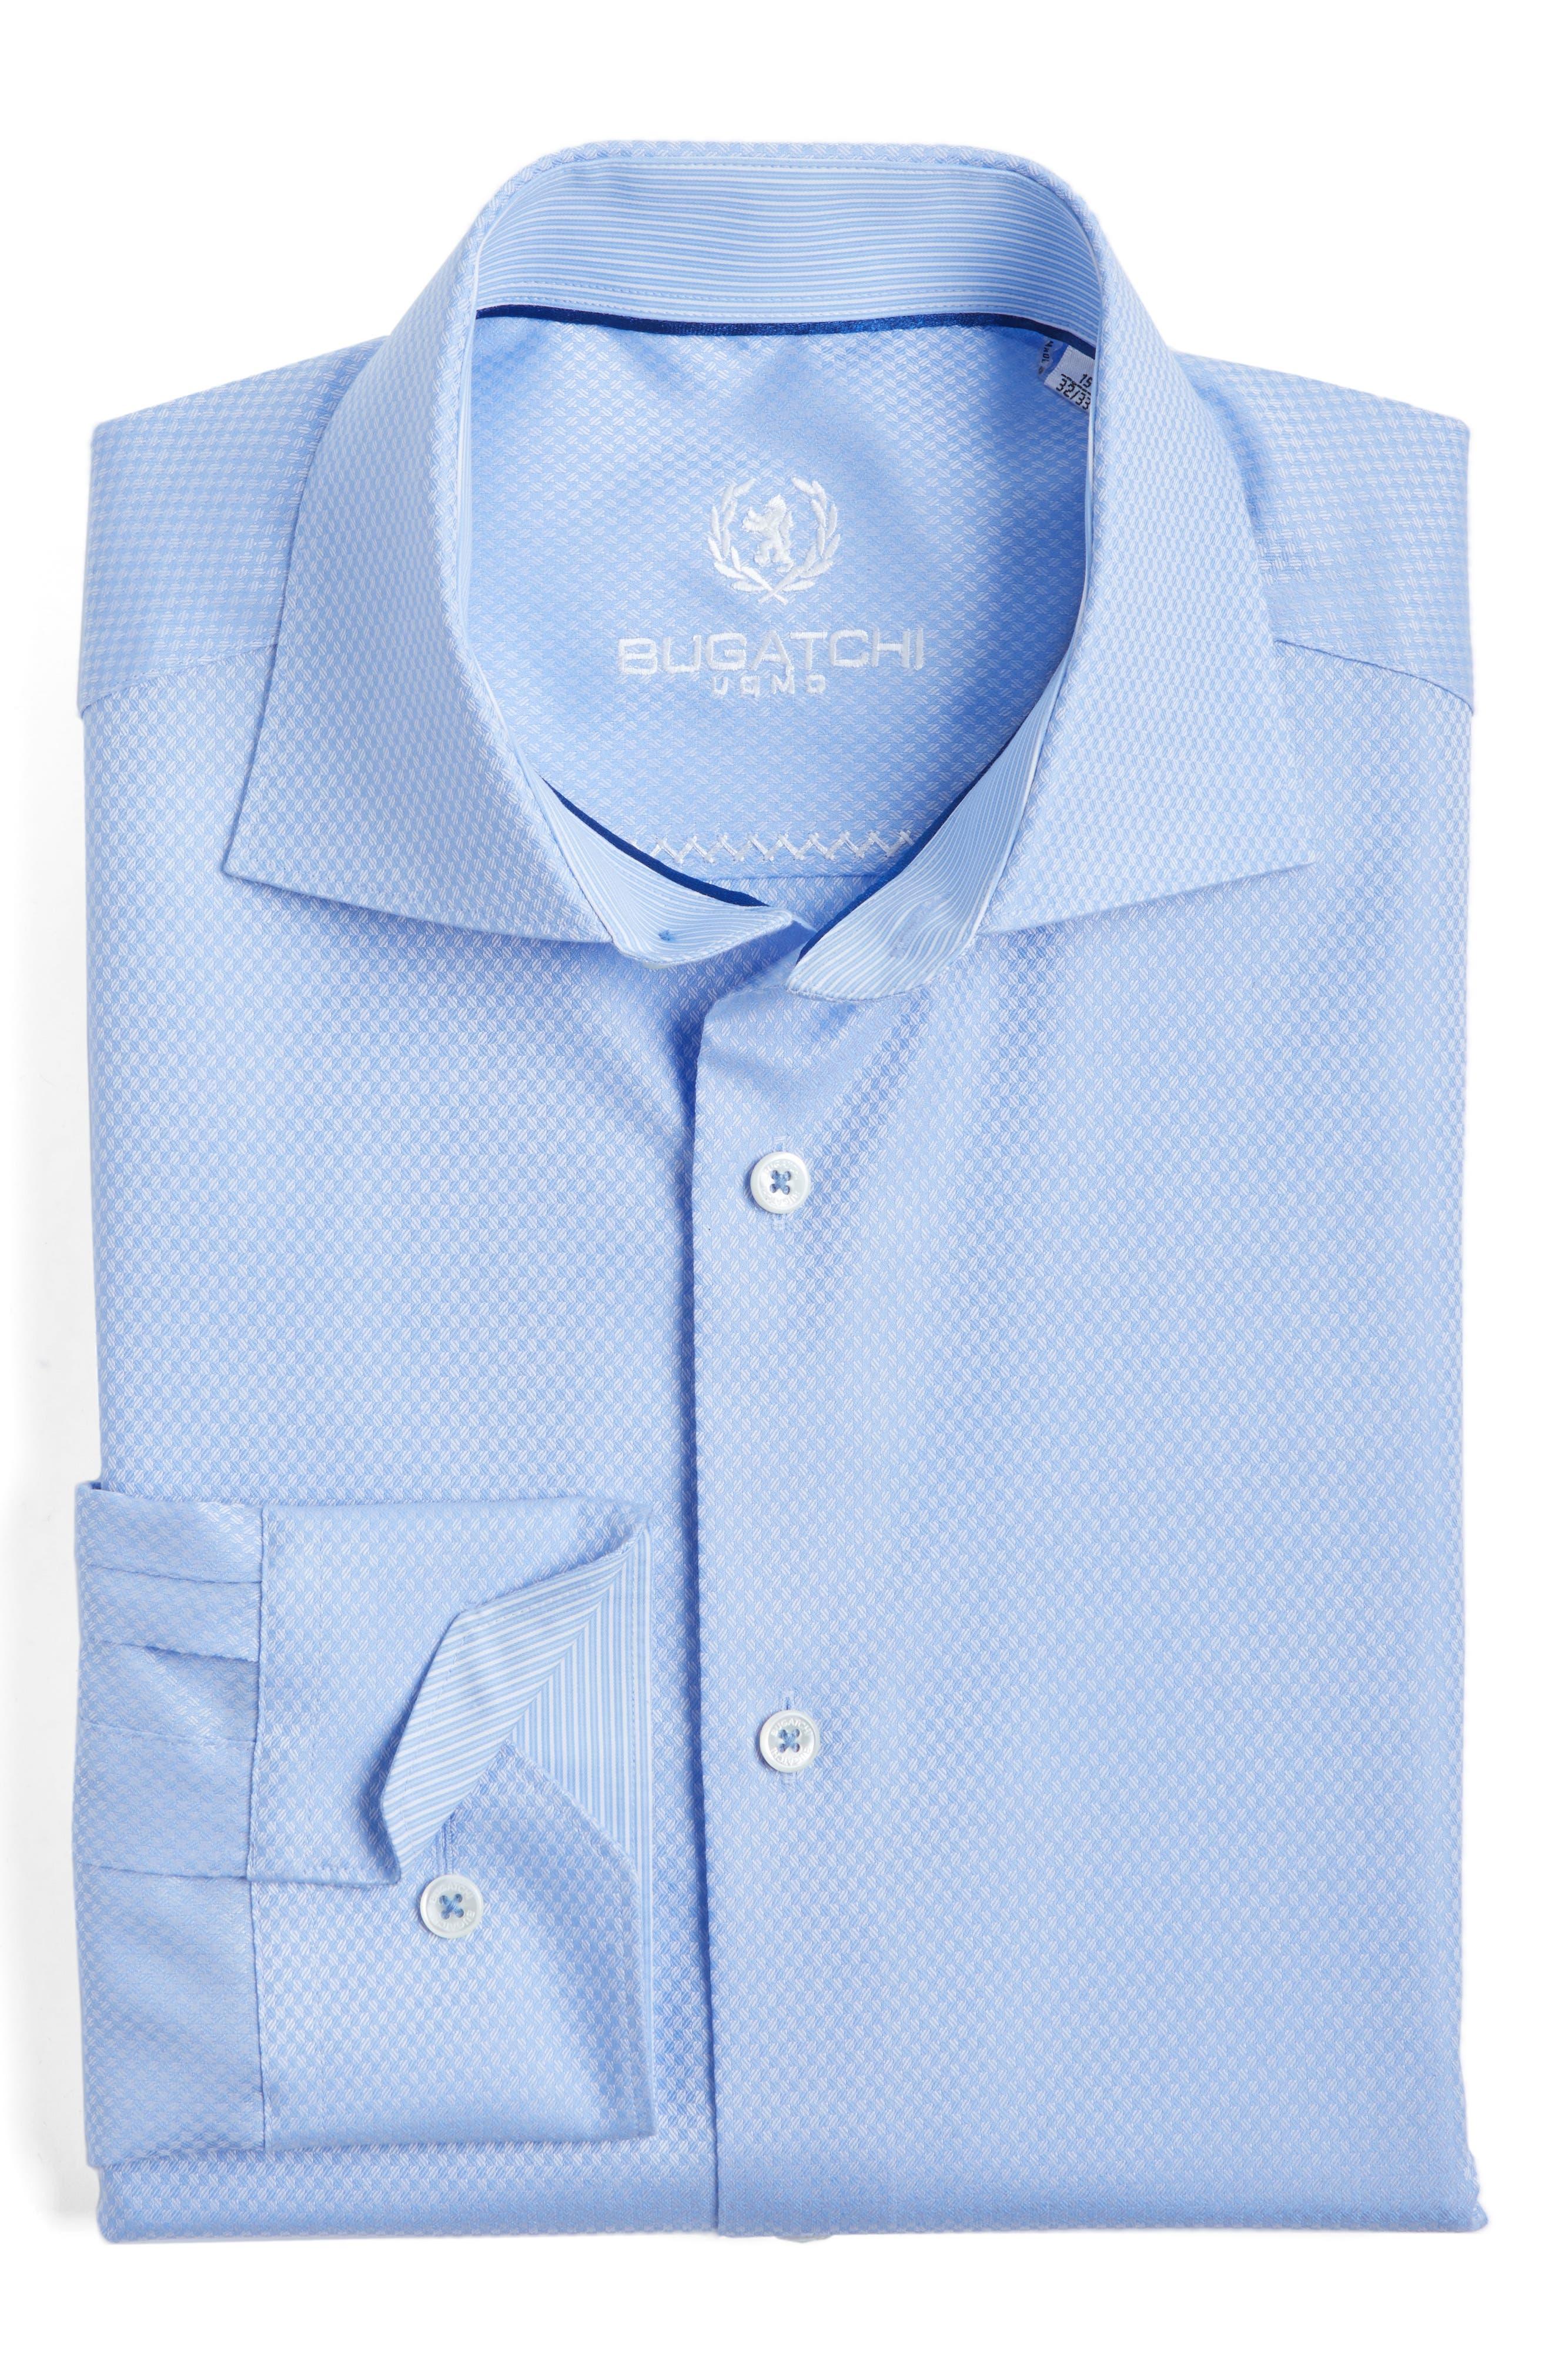 Trim Fit Twill Check Dress Shirt,                             Main thumbnail 1, color,                             459